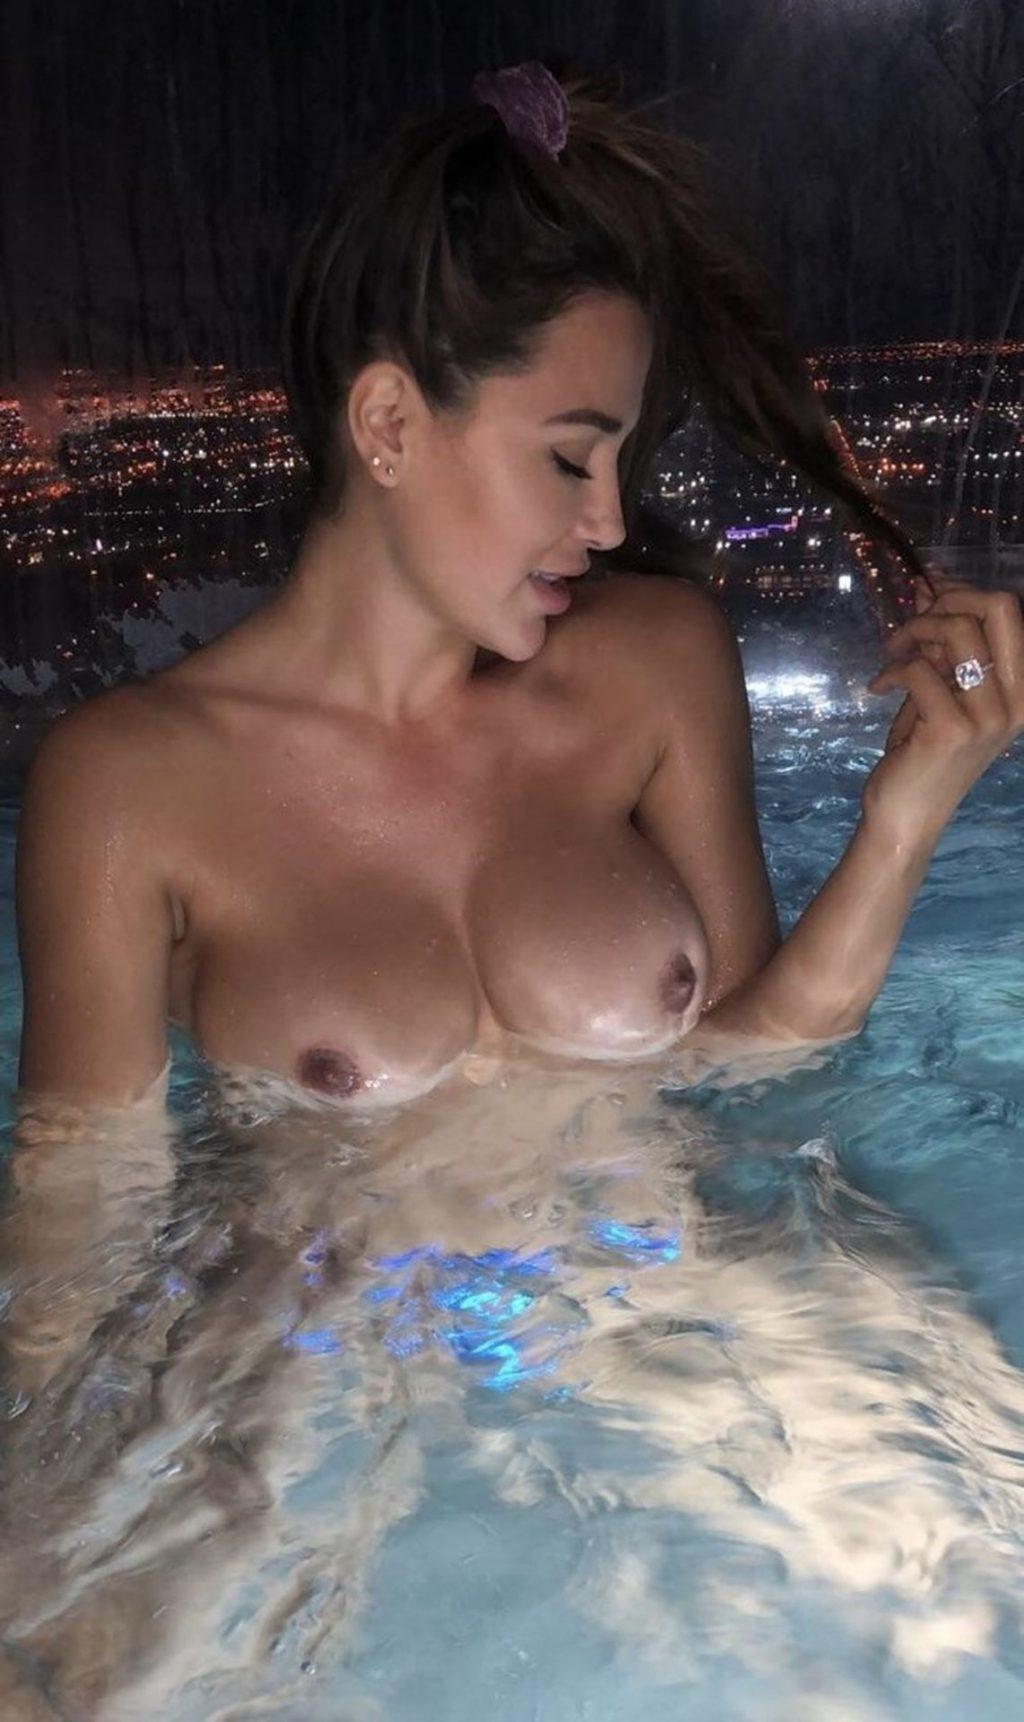 Ana Belen Nude ana cheri naked (5 photos) – ( ͡° ͜ʖ ͡°) |the fappening